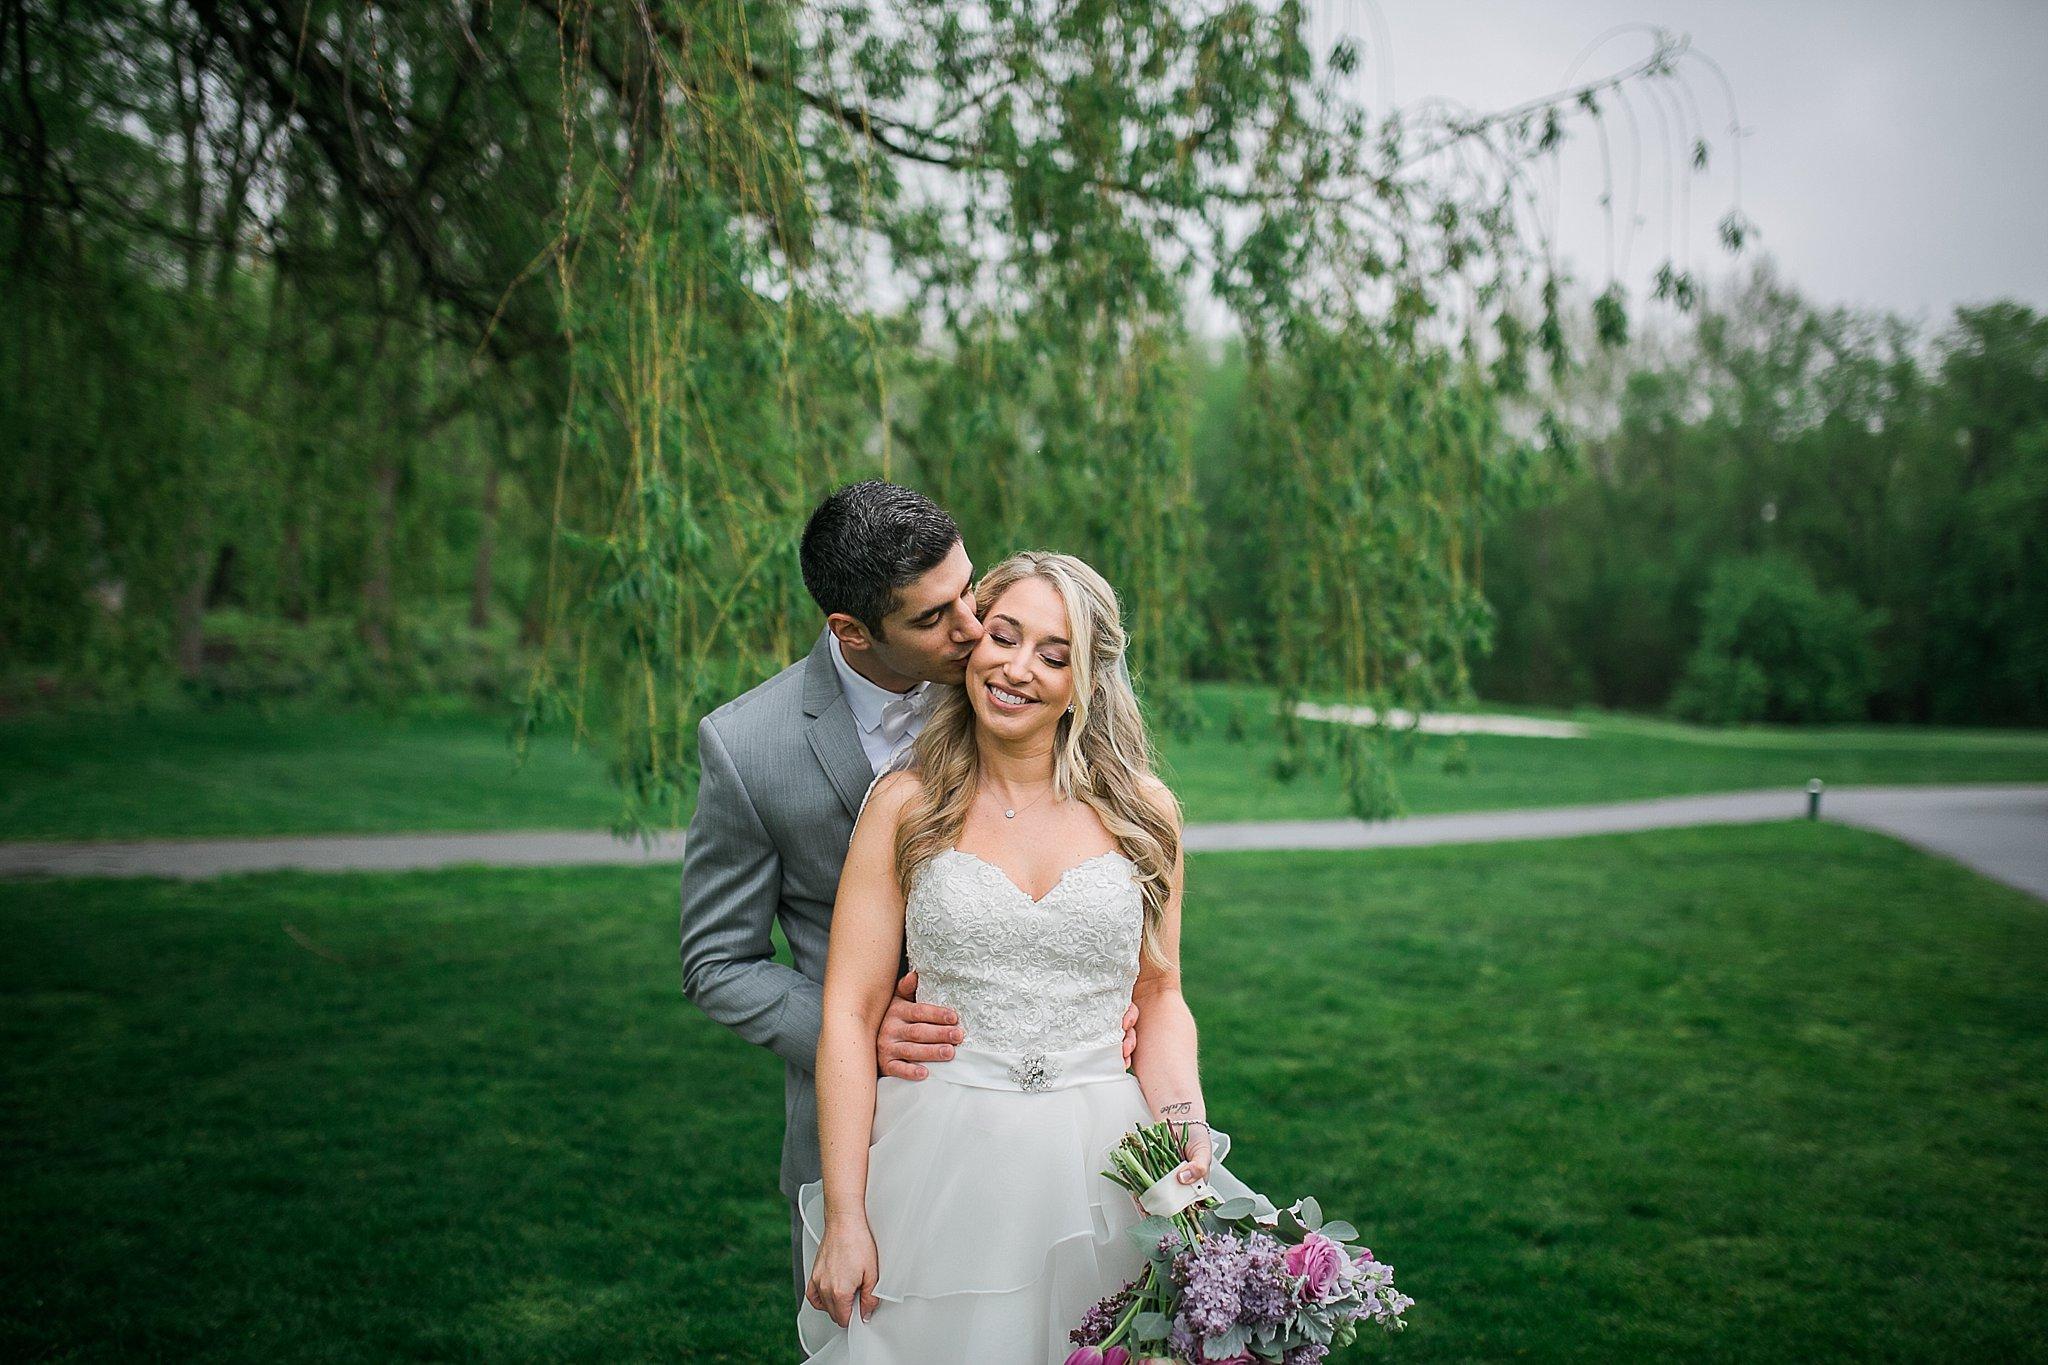 West Hills Country Club Wedding Hudson Valley Wedding Photographer Sweet Alice Photography 74.jpg